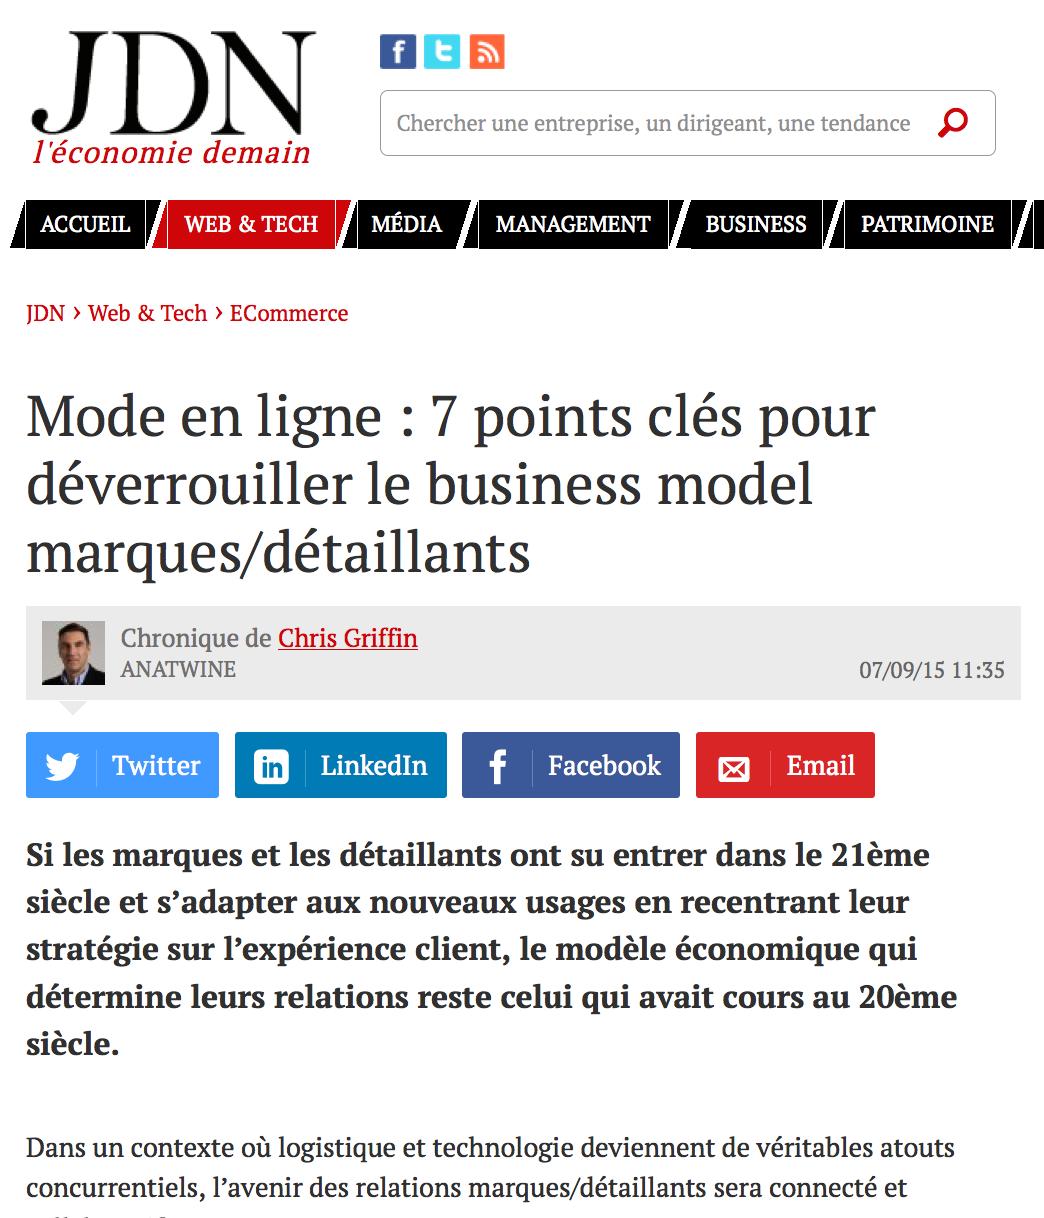 Tribune d'expert JDNET sept 2015